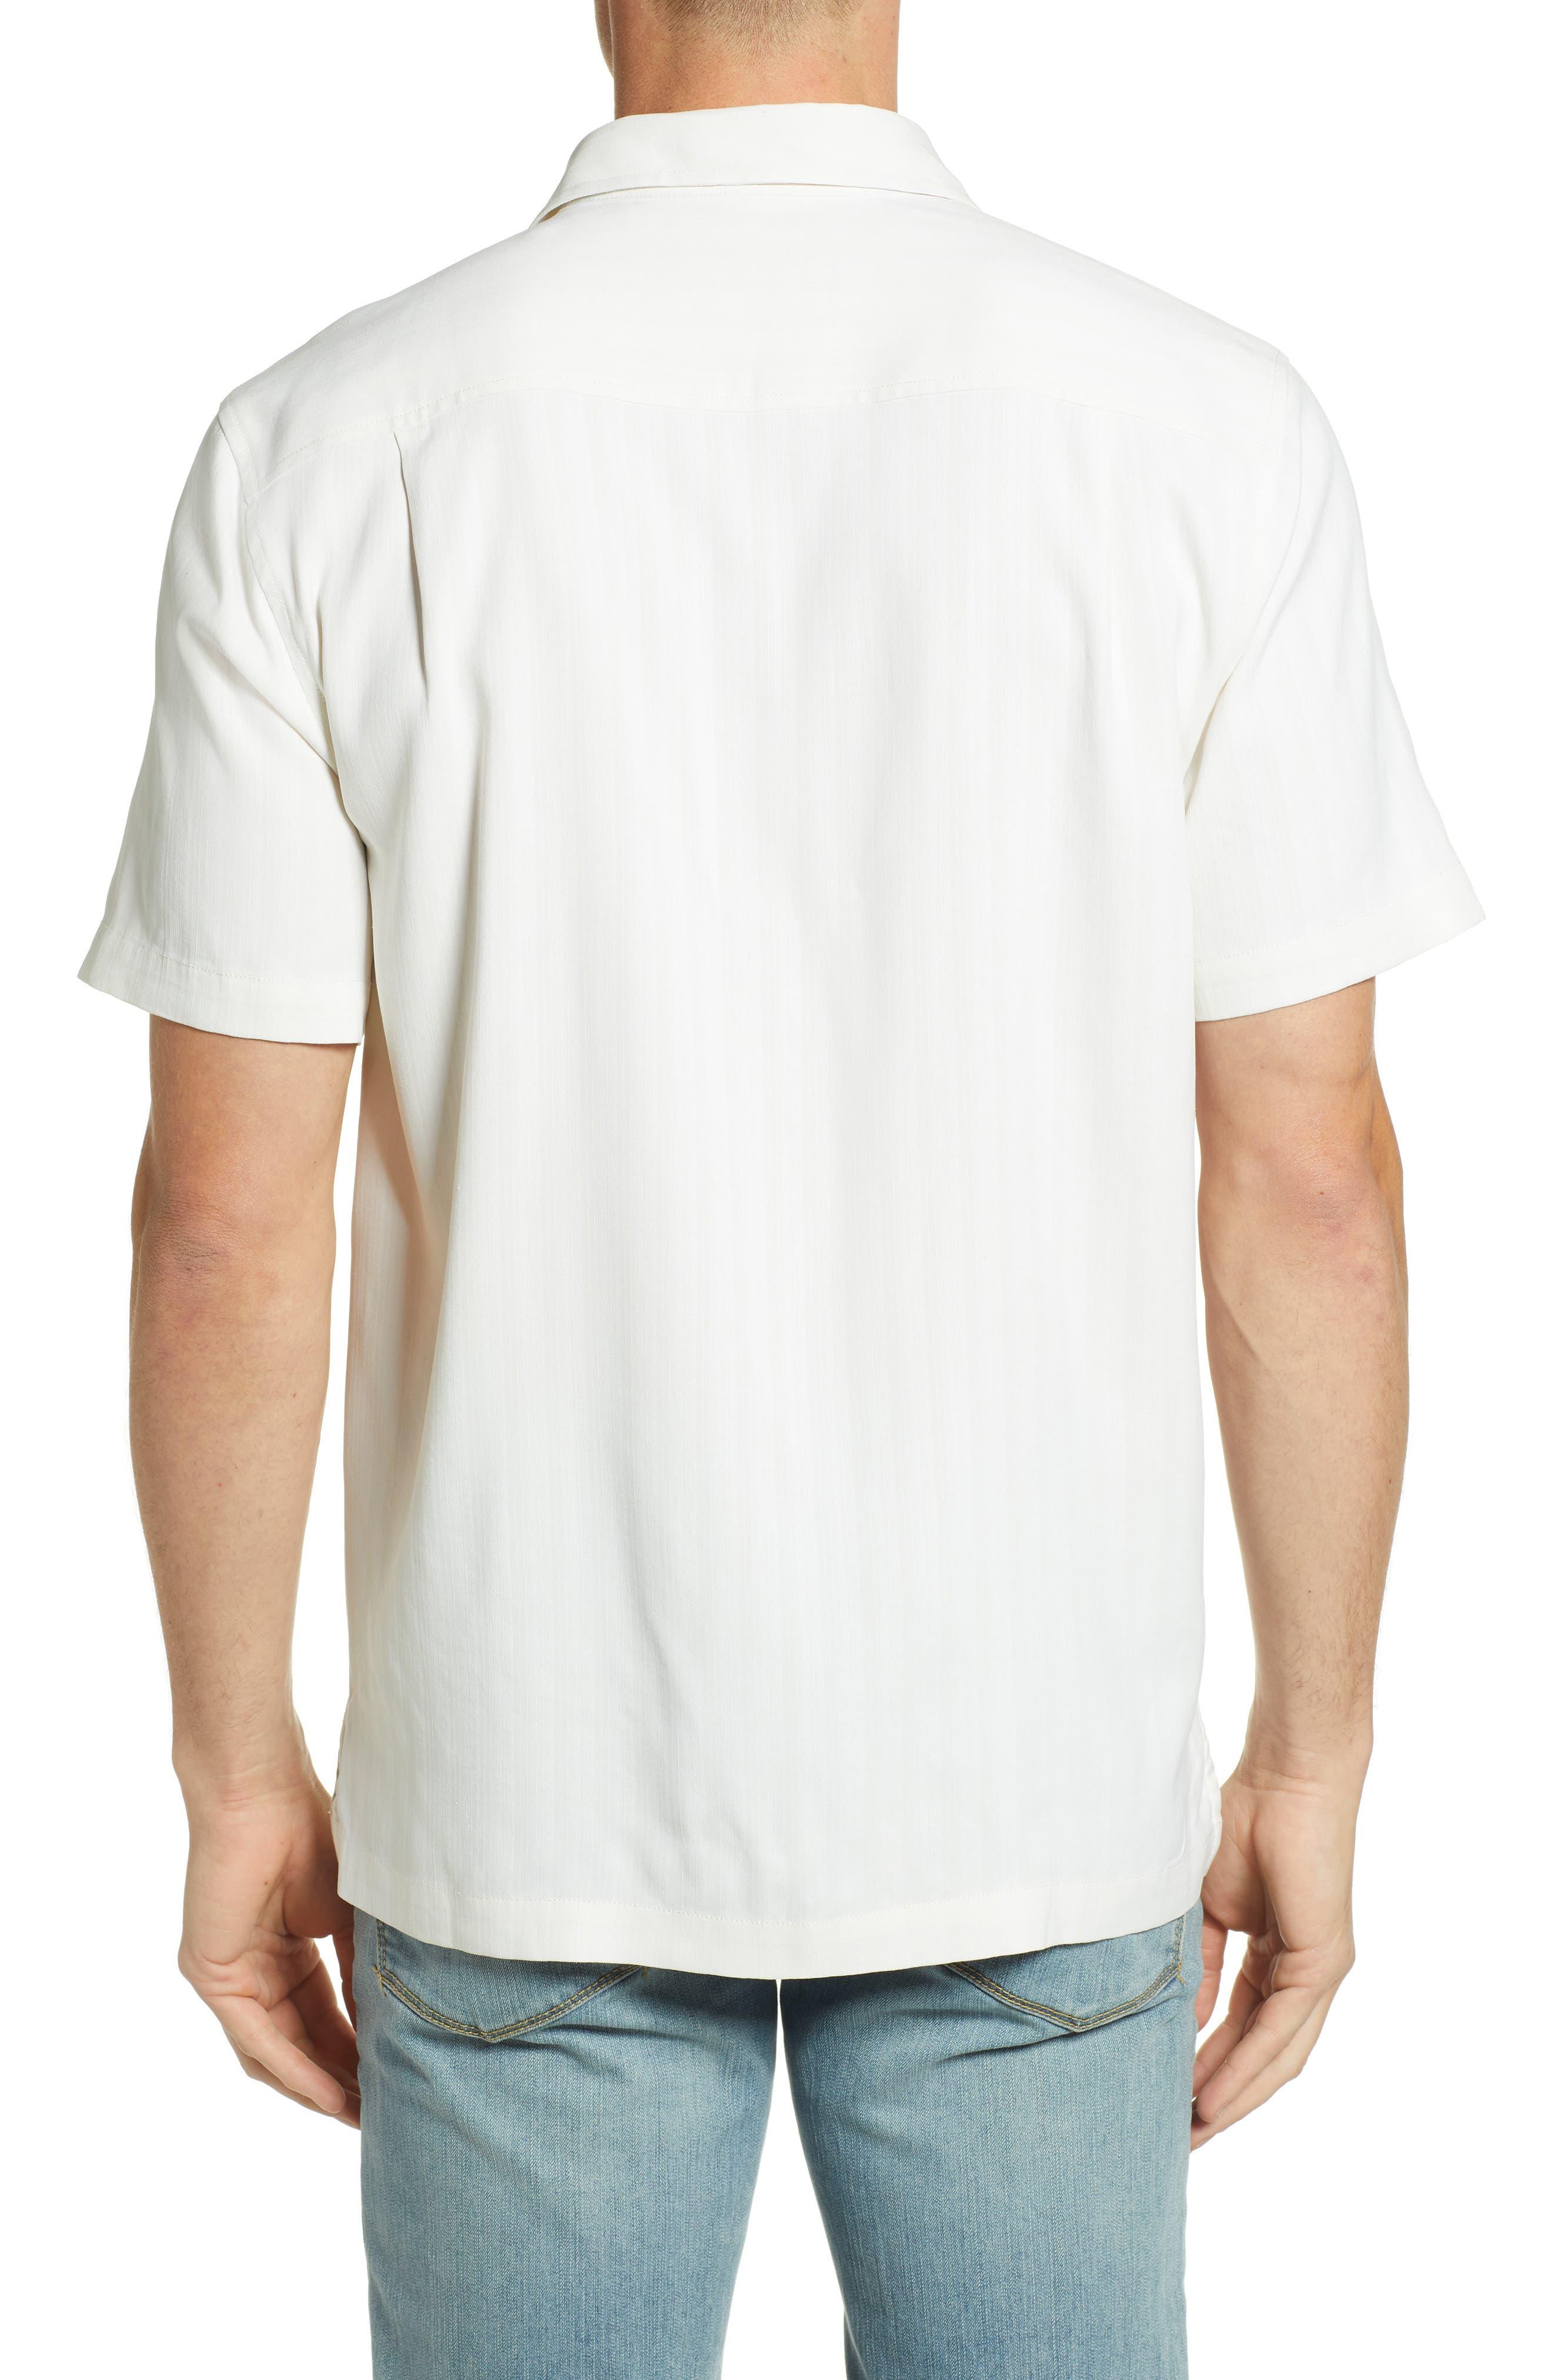 Las Playas Palms Silk Camp Shirt,                             Alternate thumbnail 2, color,                             TWILL